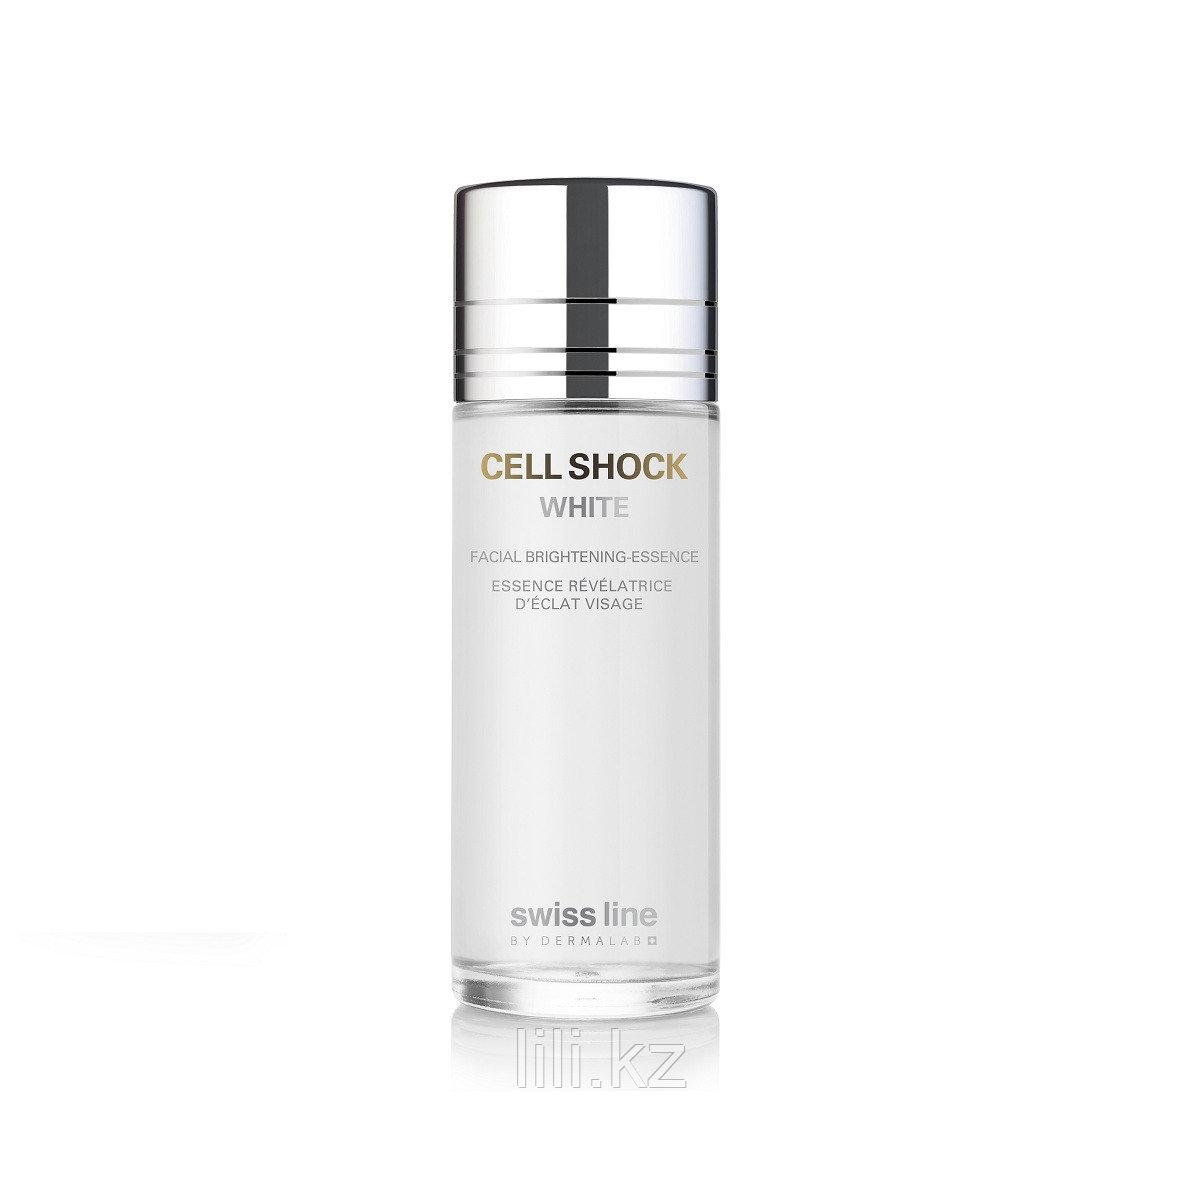 Отбеливающая, осветляющая эссенция- Cell Shock White Facial Brightening – Essence 150 мл.